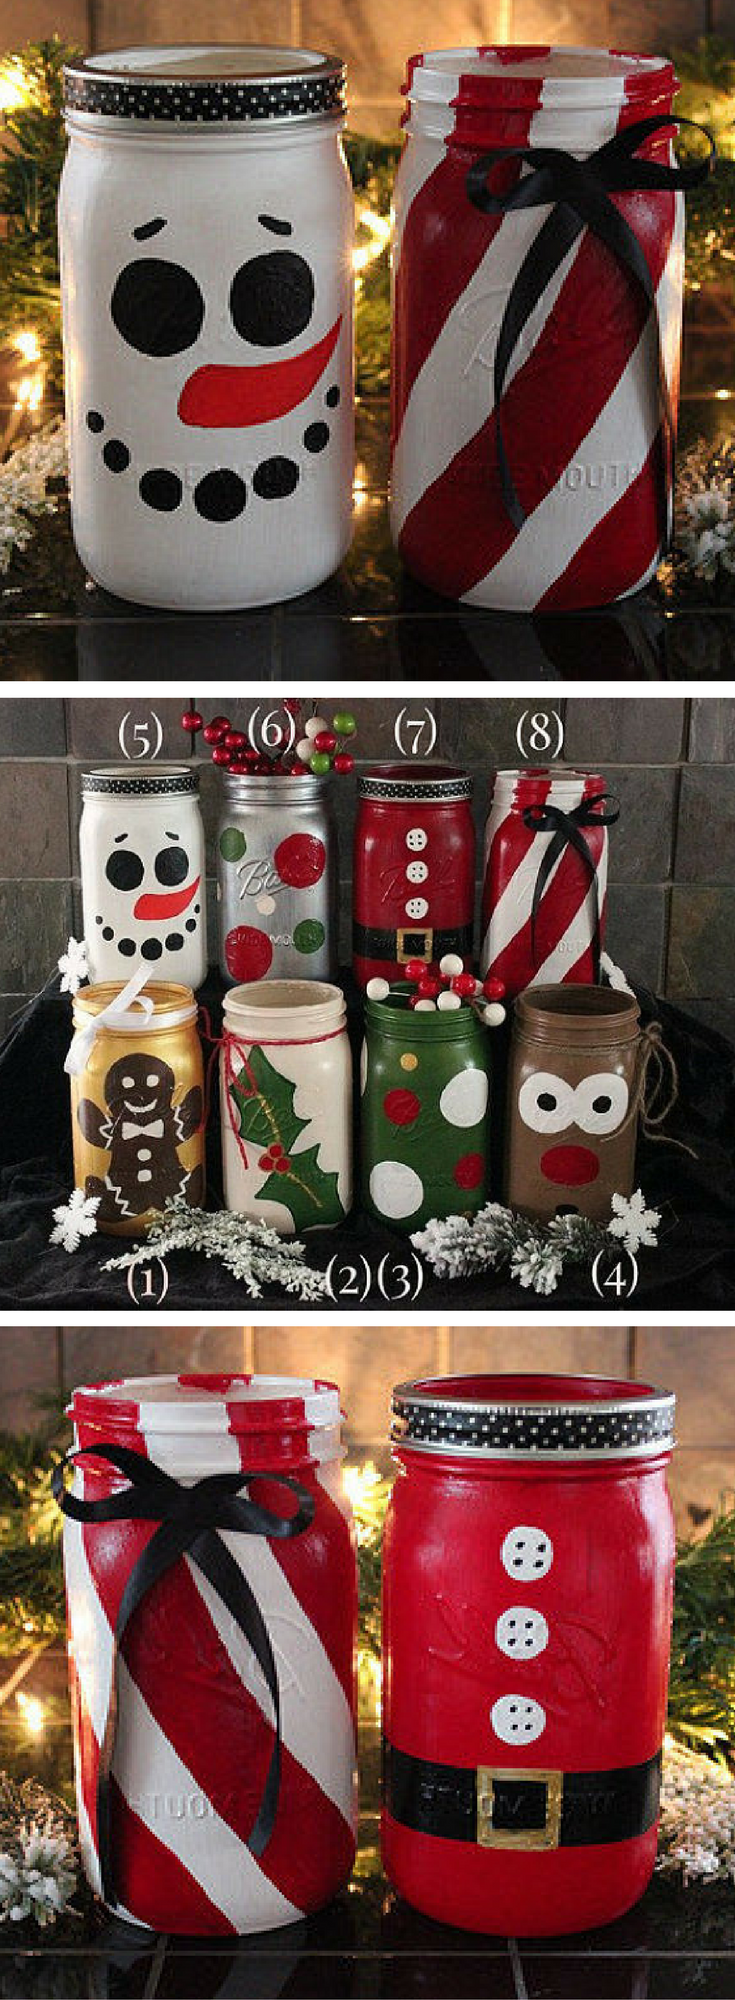 My Aunt Made Something Like This It S So Creative And Crafty Christmas Jars Christmas Mason Jars Christmas Crafts